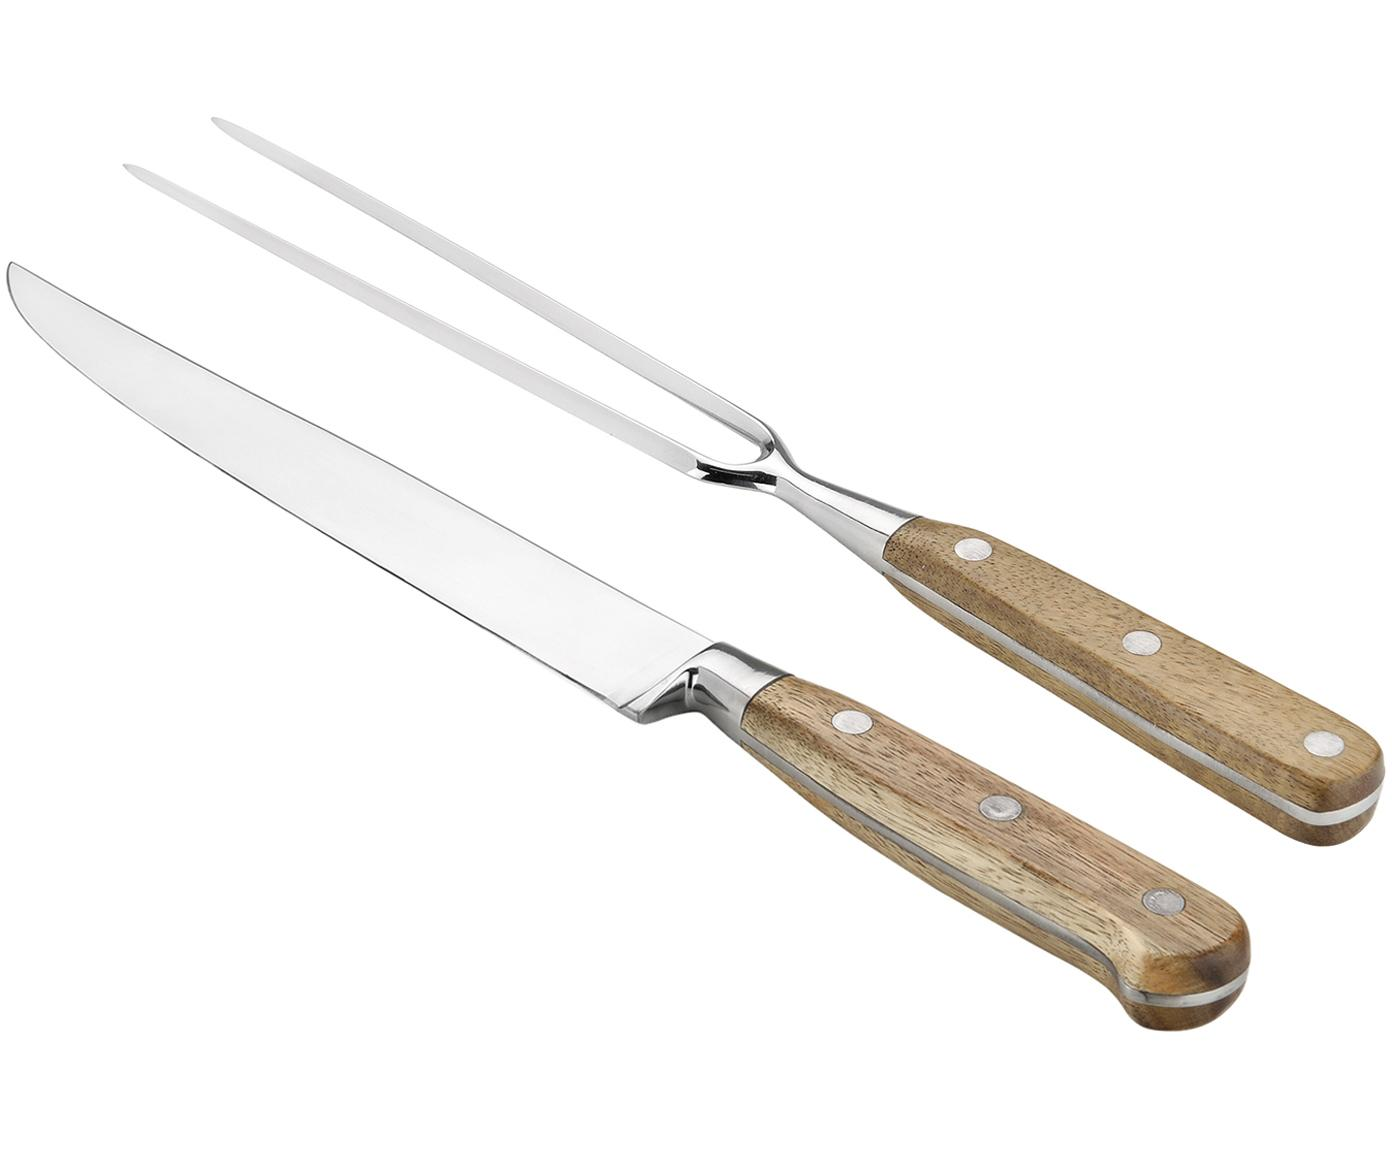 Komplet do krojenia mięsa Var, 2 elem., Drewno akacjowe, stal szlachetna , Różne rozmiary